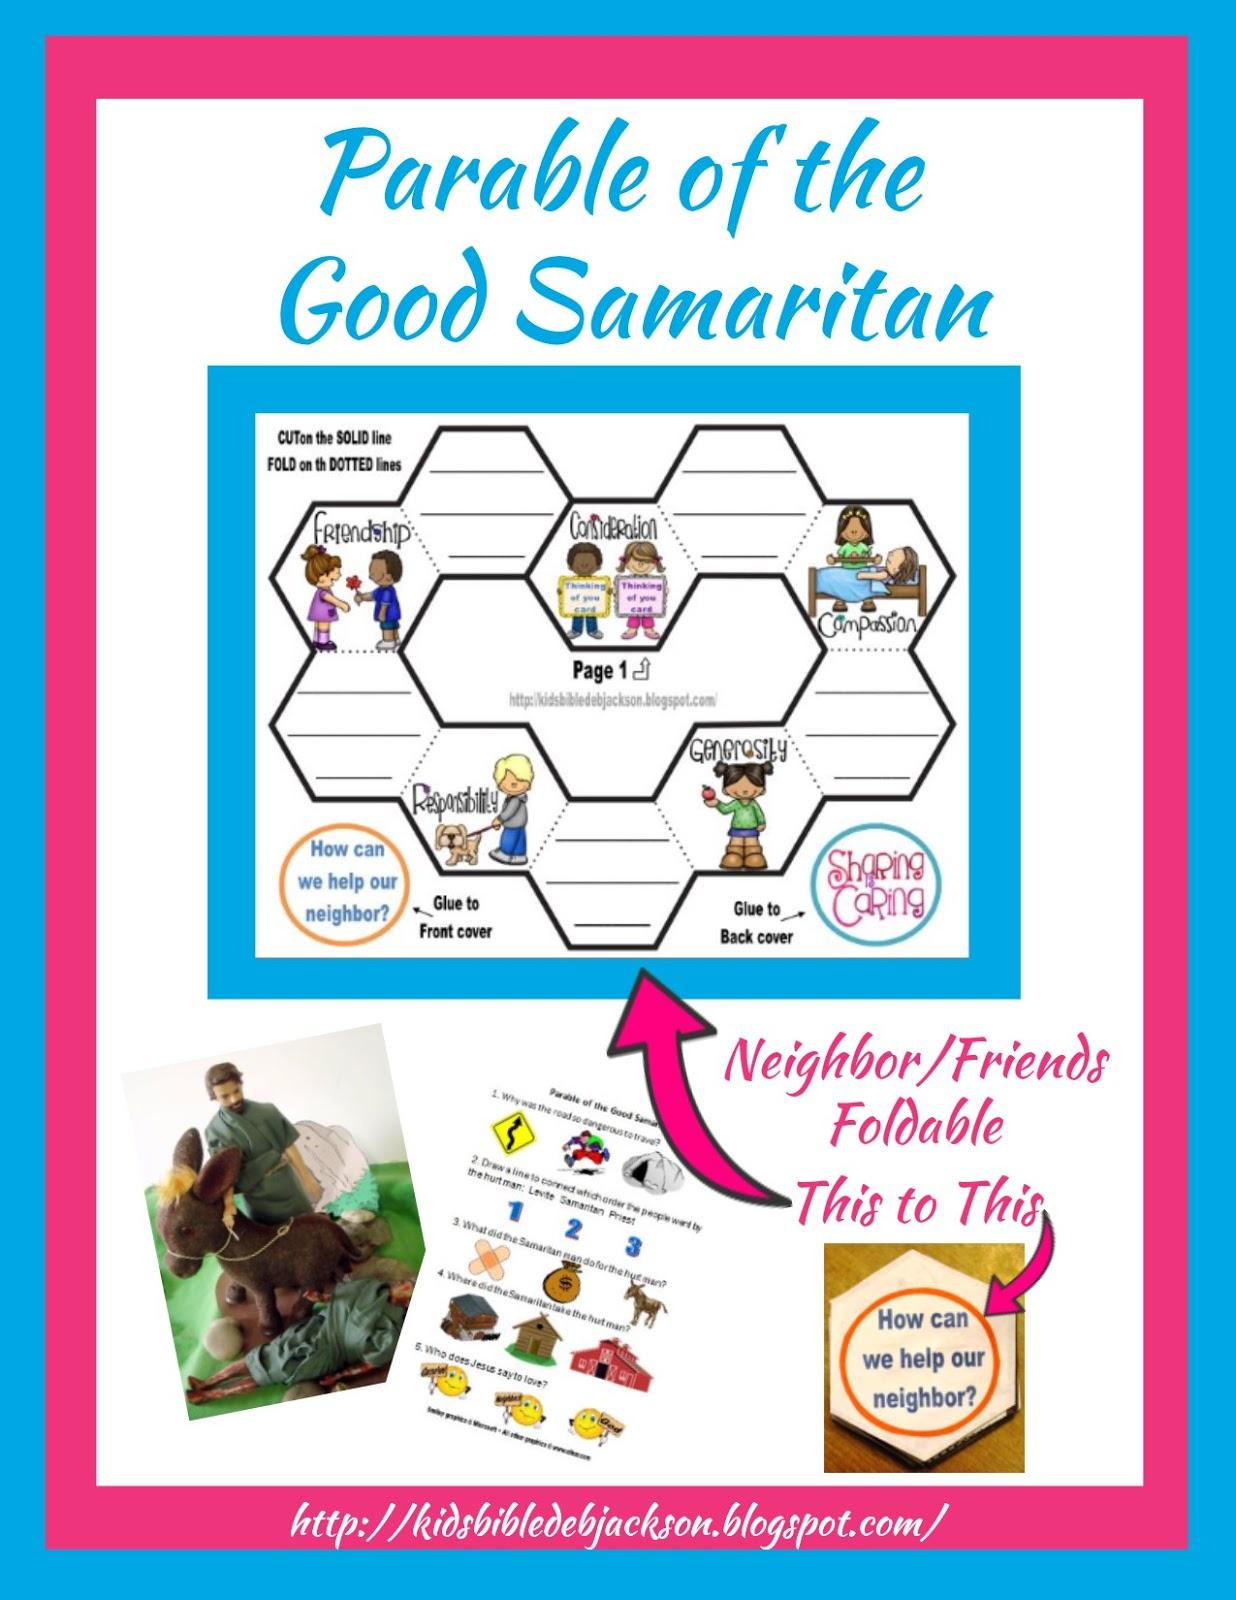 http://kidsbibledebjackson.blogspot.com/2014/10/parable-of-good-samaritan.html